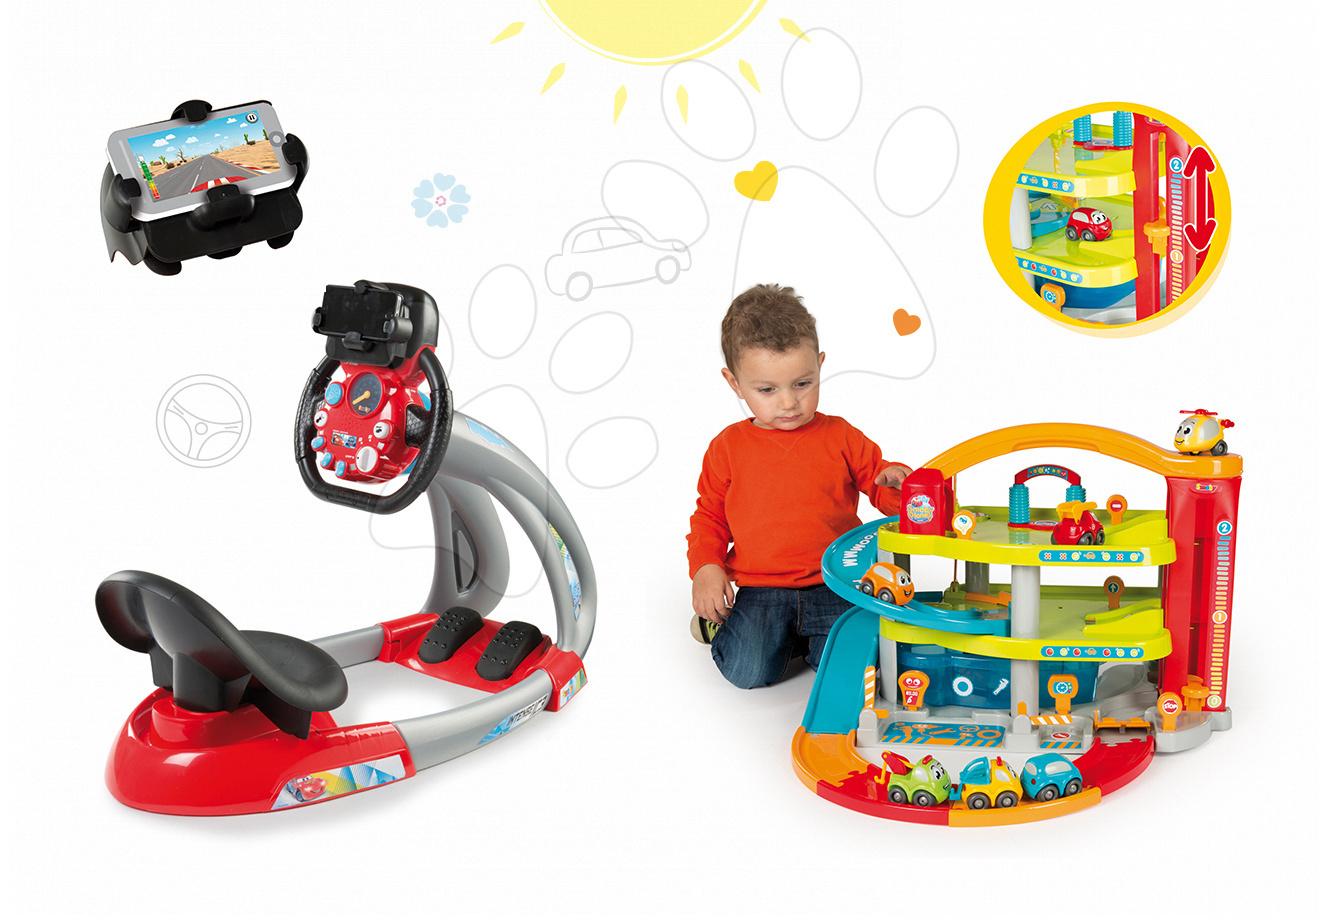 Smoby dětský elektronický trenažér V8 Driver a dvoupatrová garáž Vroom Planet 370206-2